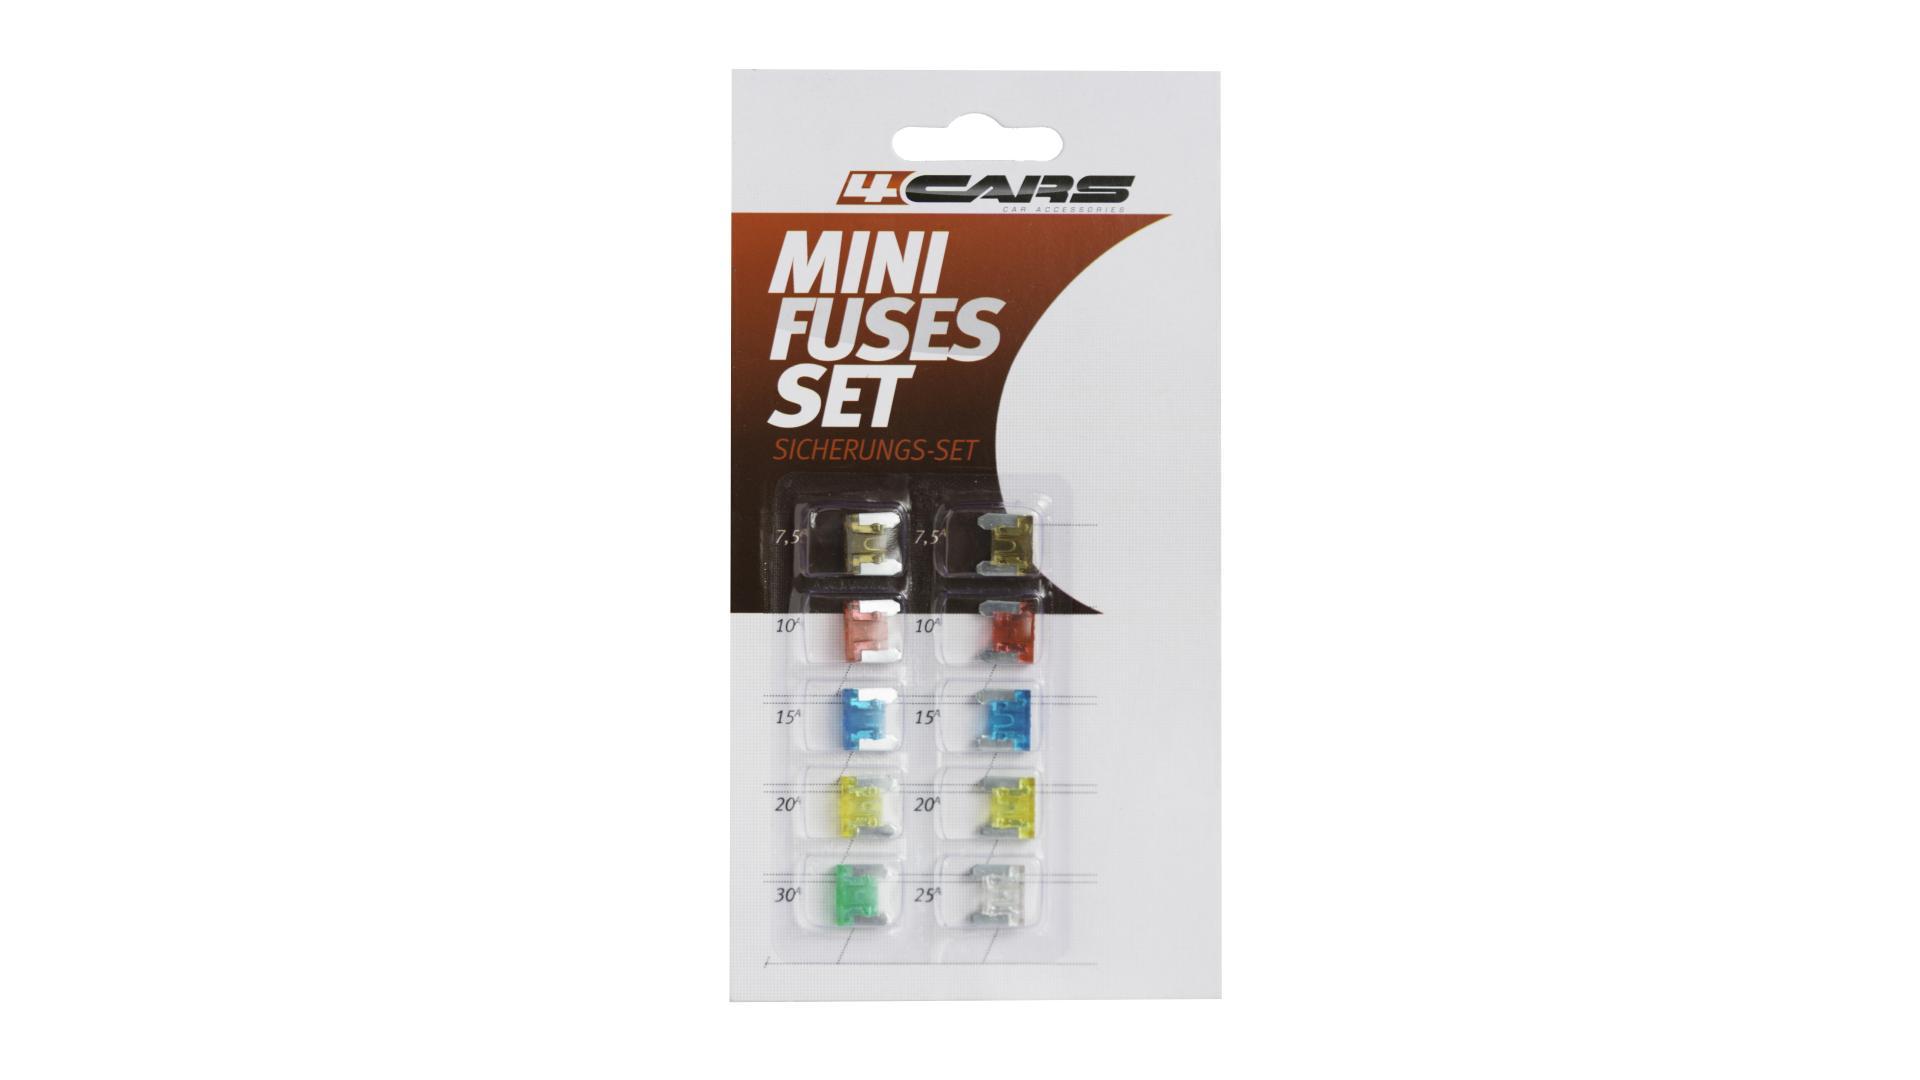 4CARS micro fuse